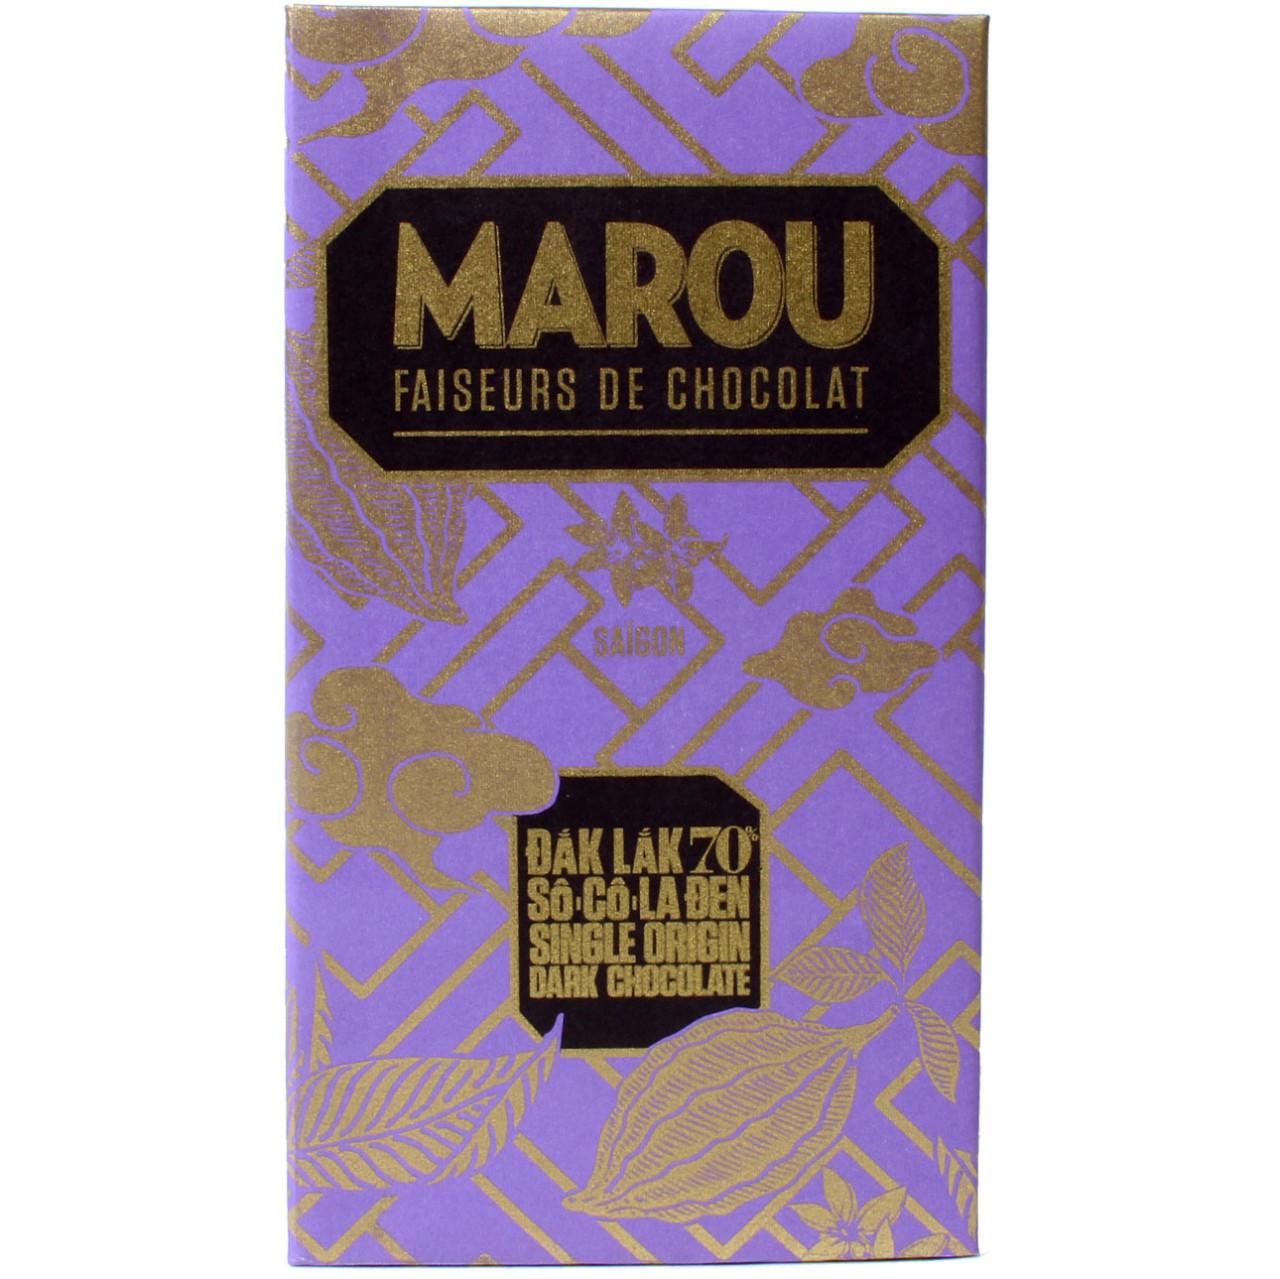 Marou, Vietnam, dunkle Schokolade, Single Origin Schokolade, sojafreie Schokolade, lezithinfreie Schokolade, glutenfreie Schokolade, milchfreie Schokolade, dark chocolate, - $seoKeywords- Chocolats-De-Luxe